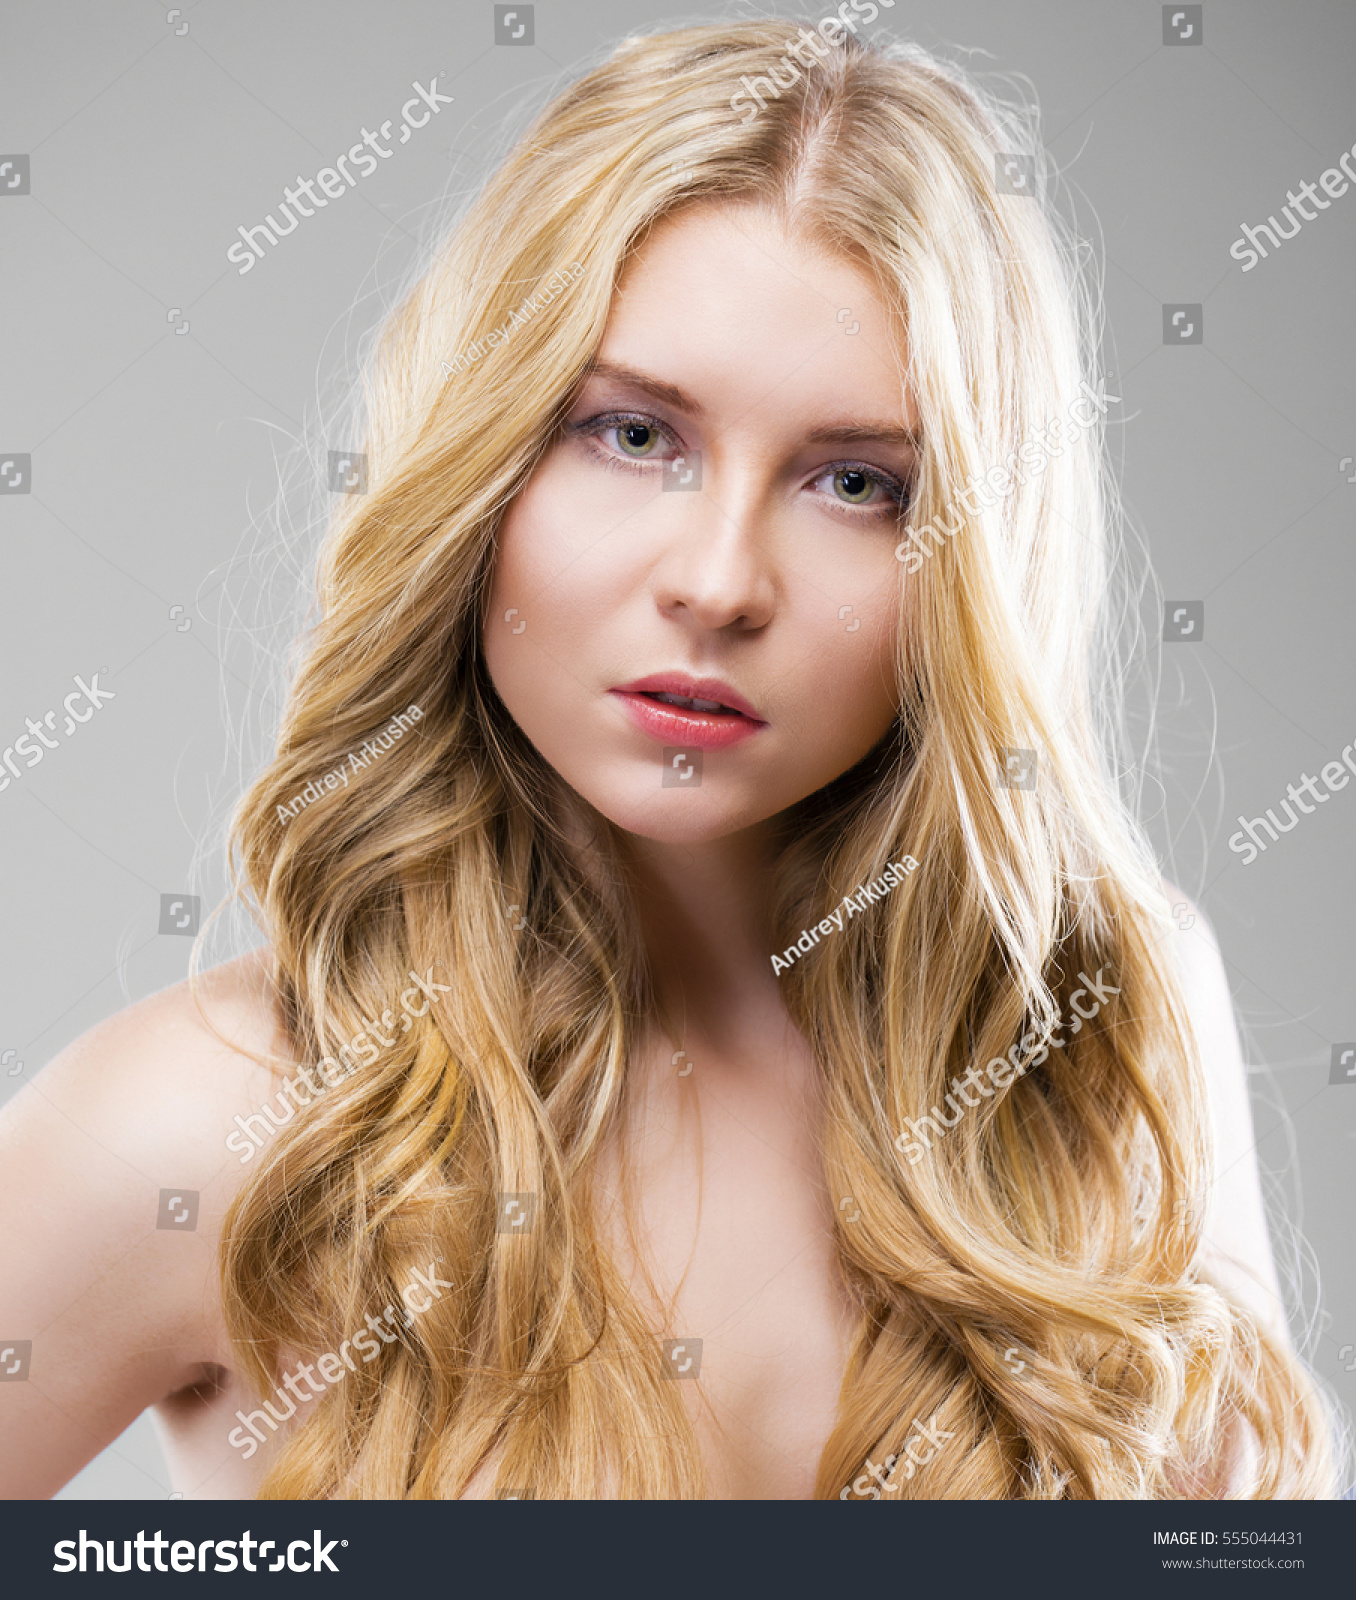 Nude blonde girl Teen Girls